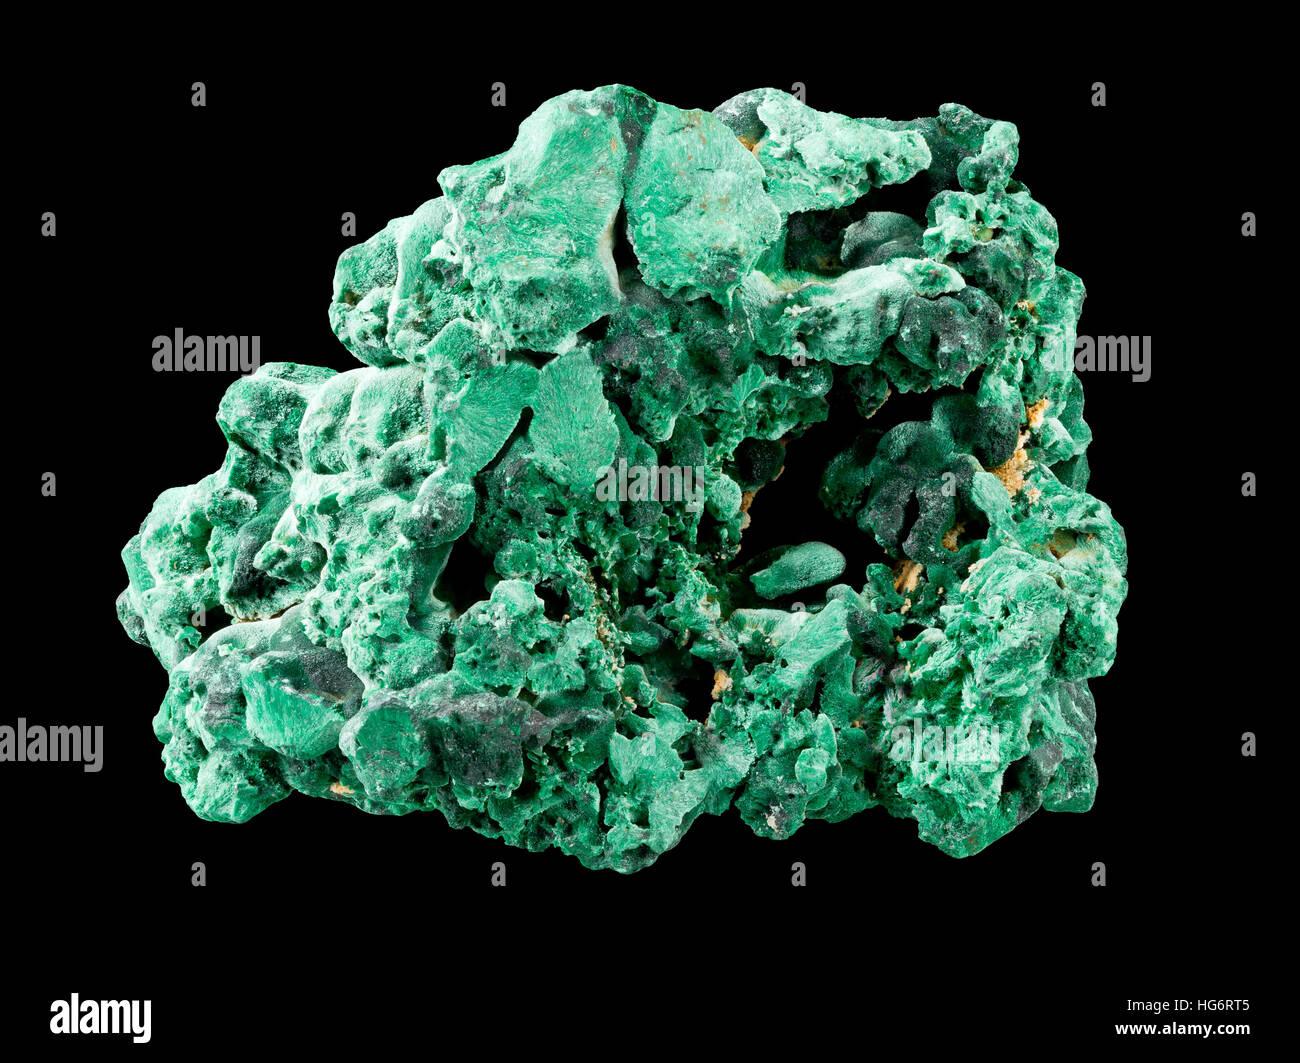 Raw, uncut malachite (cu2co3(oh)2) isolated on black background - Stock Image